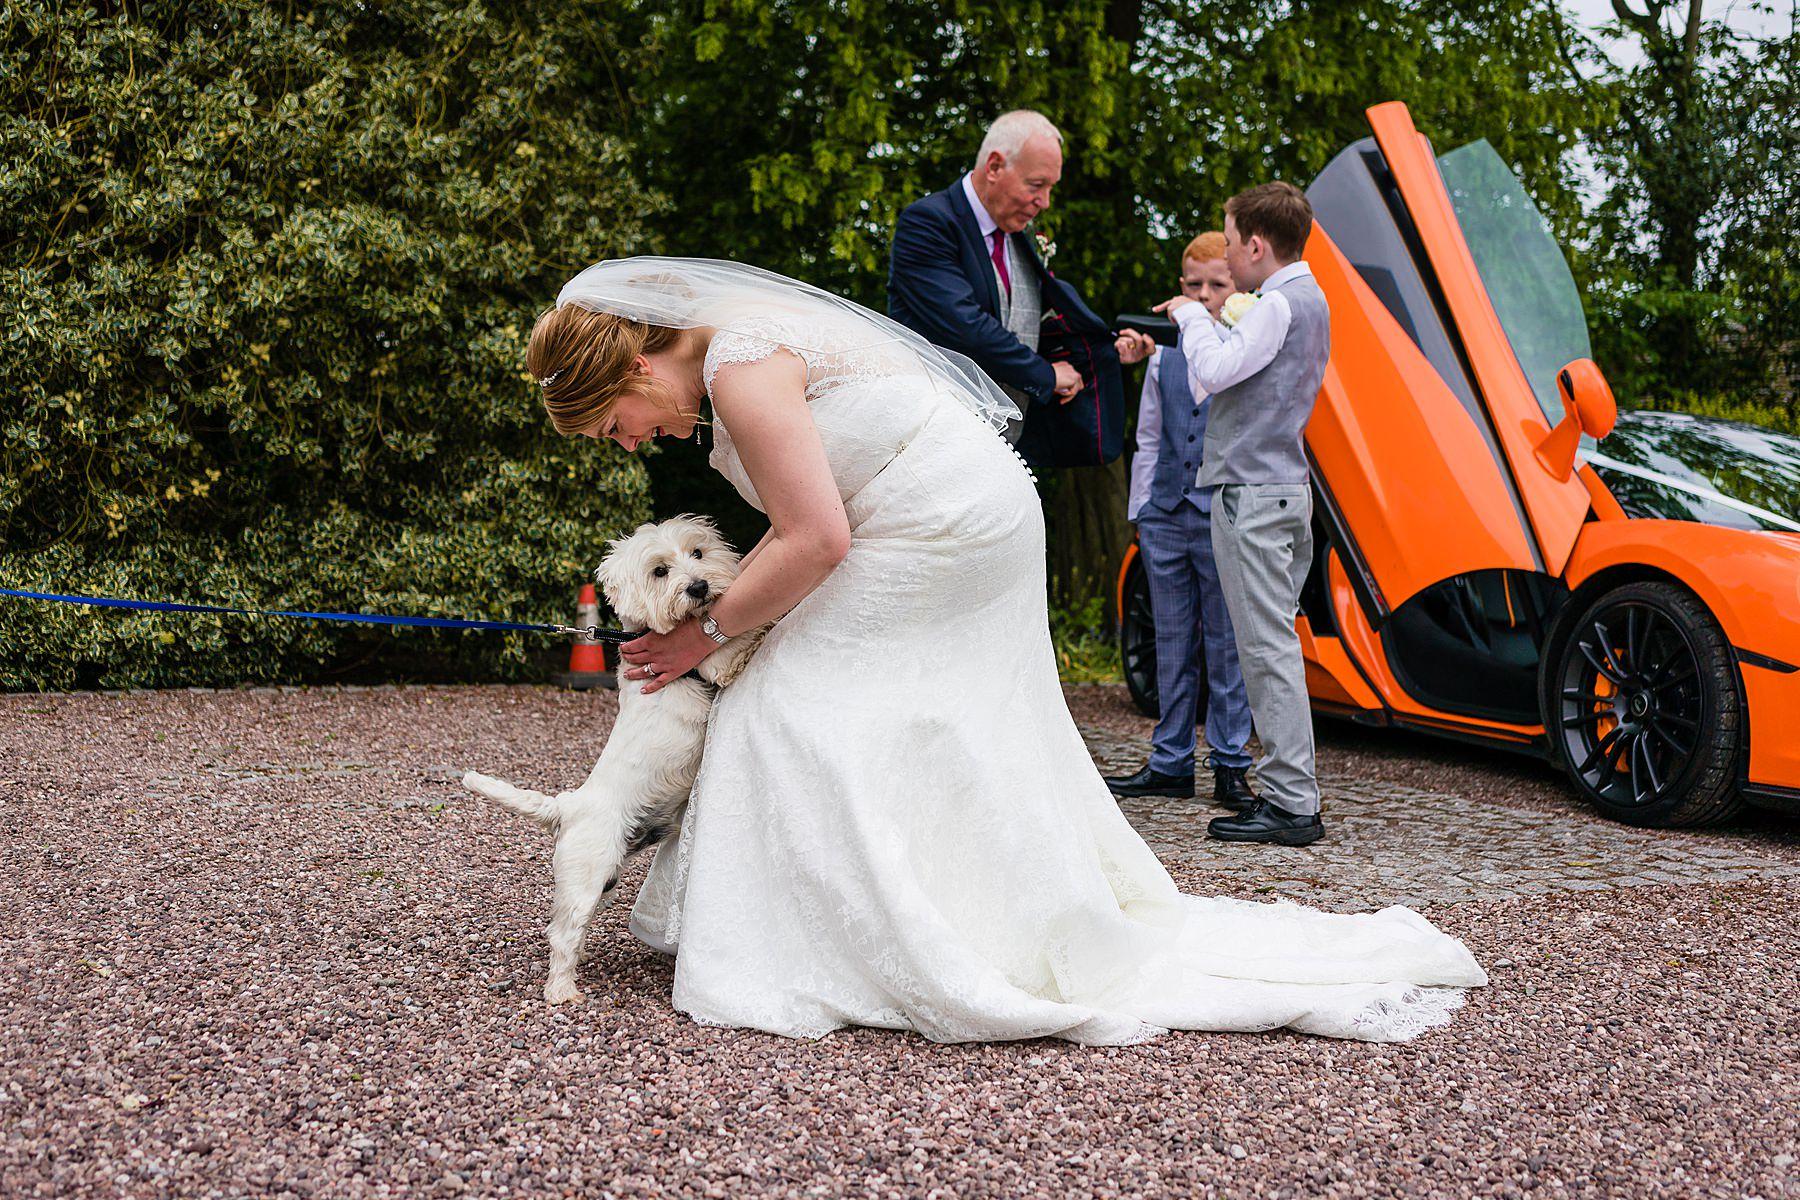 brides dog